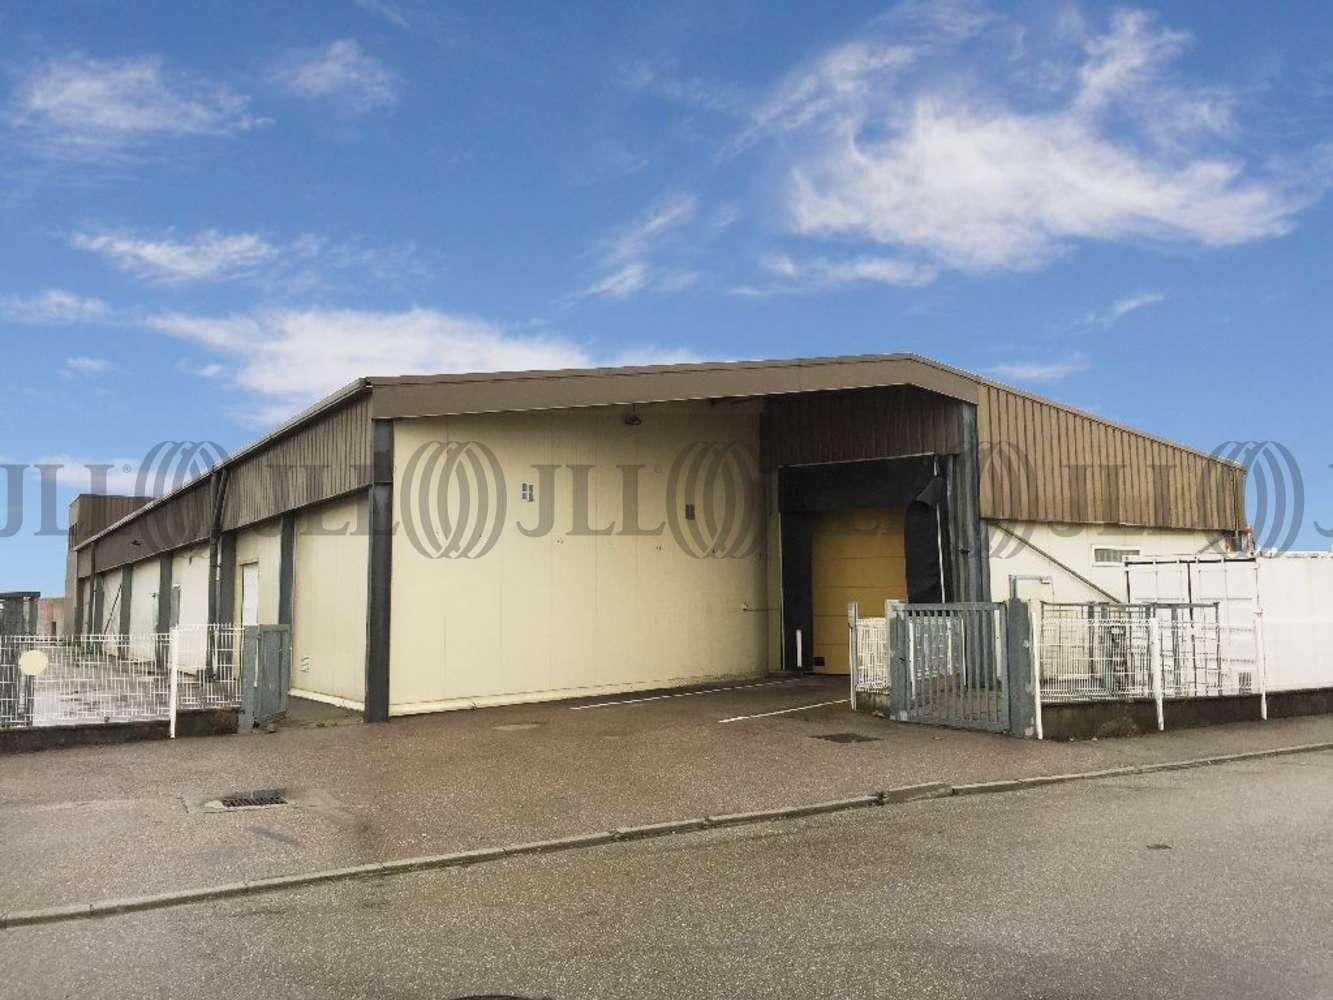 Activités/entrepôt Corbas, 69960 - Location entrepot Corbas - Type Froid - 9552075